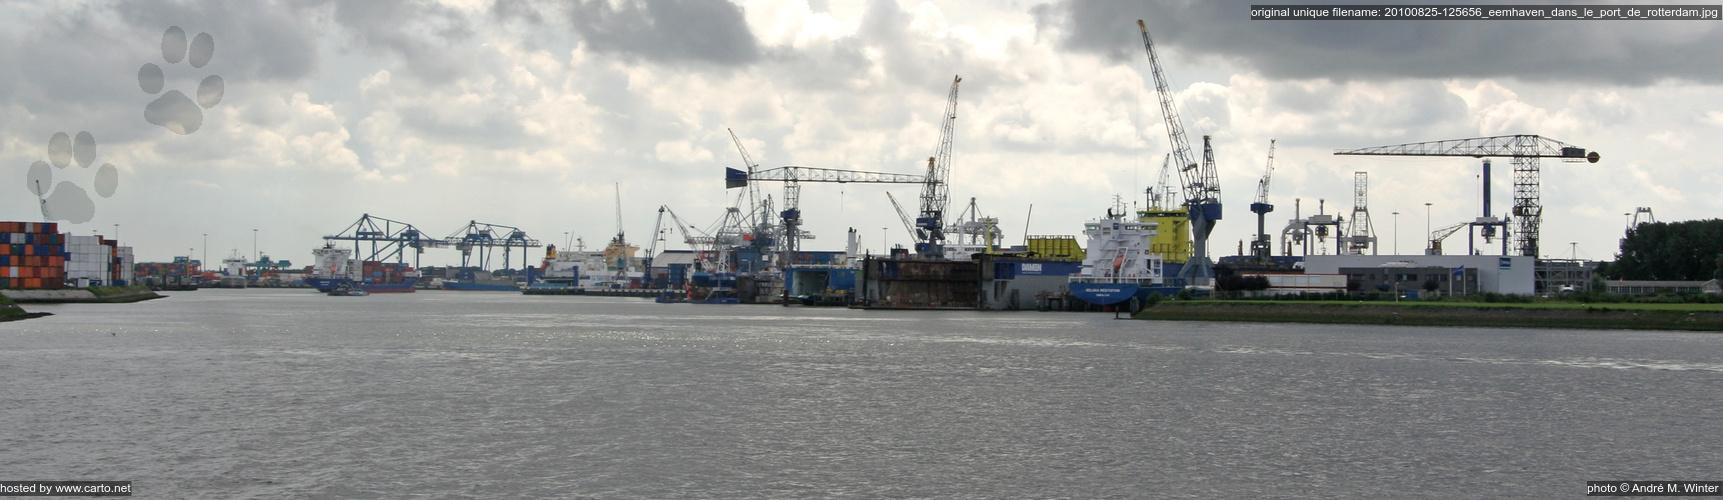 eemhaven dans le port de rotterdam port de rotterdam ao 251 t 2010